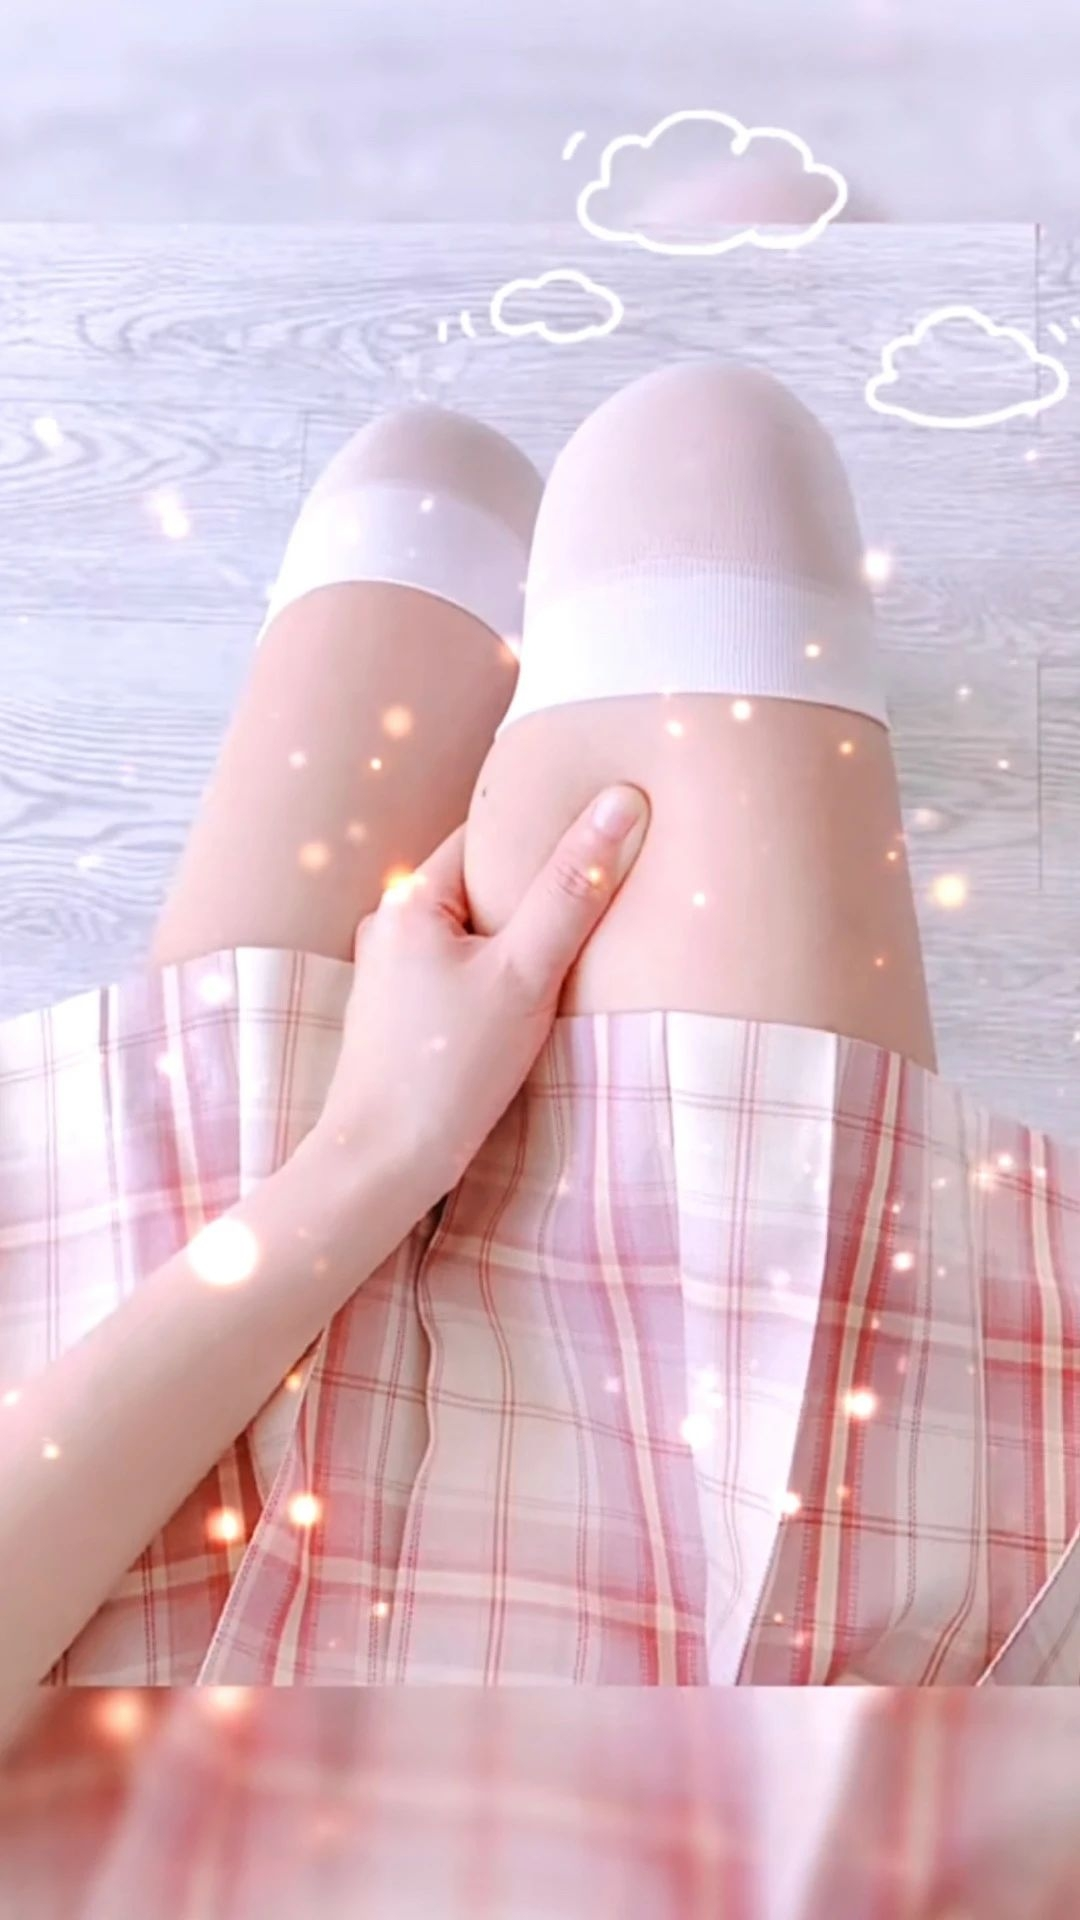 4K可爱女生性感女神手机壁纸图库(四)